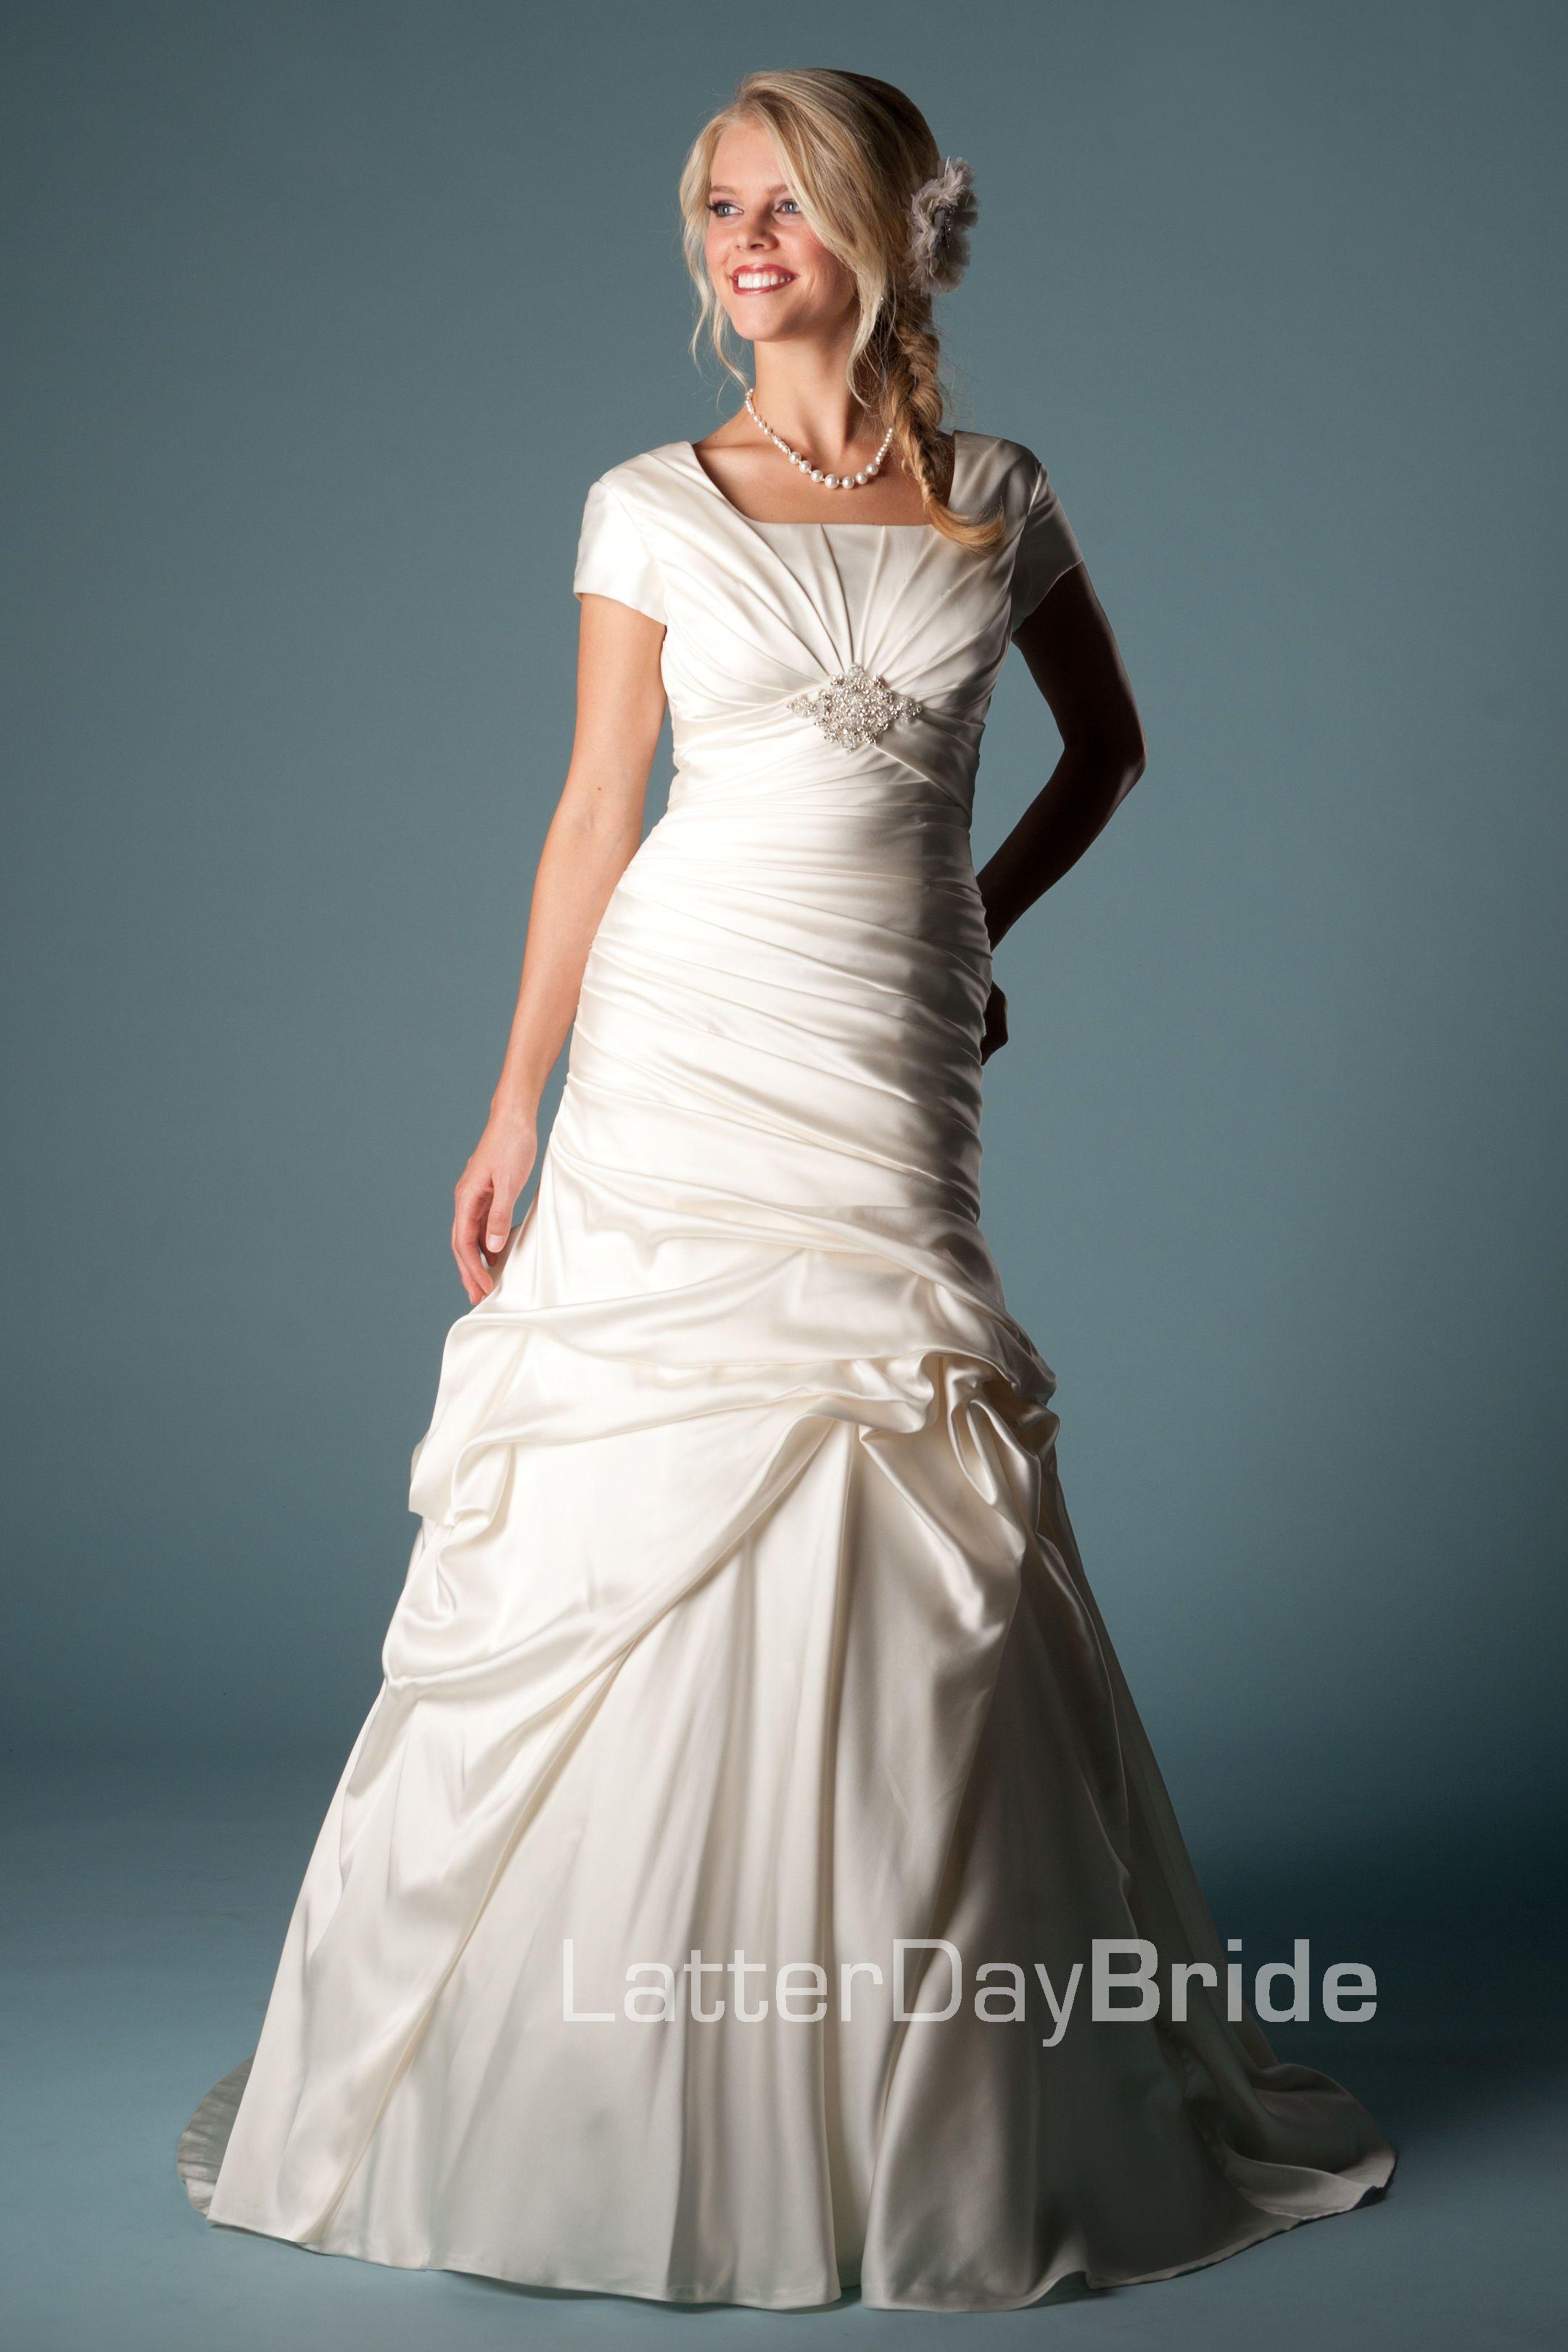 Modest Wedding Dress, Chantarel | LatterDayBride & Prom. Modest Mormon LDS Temple Dress